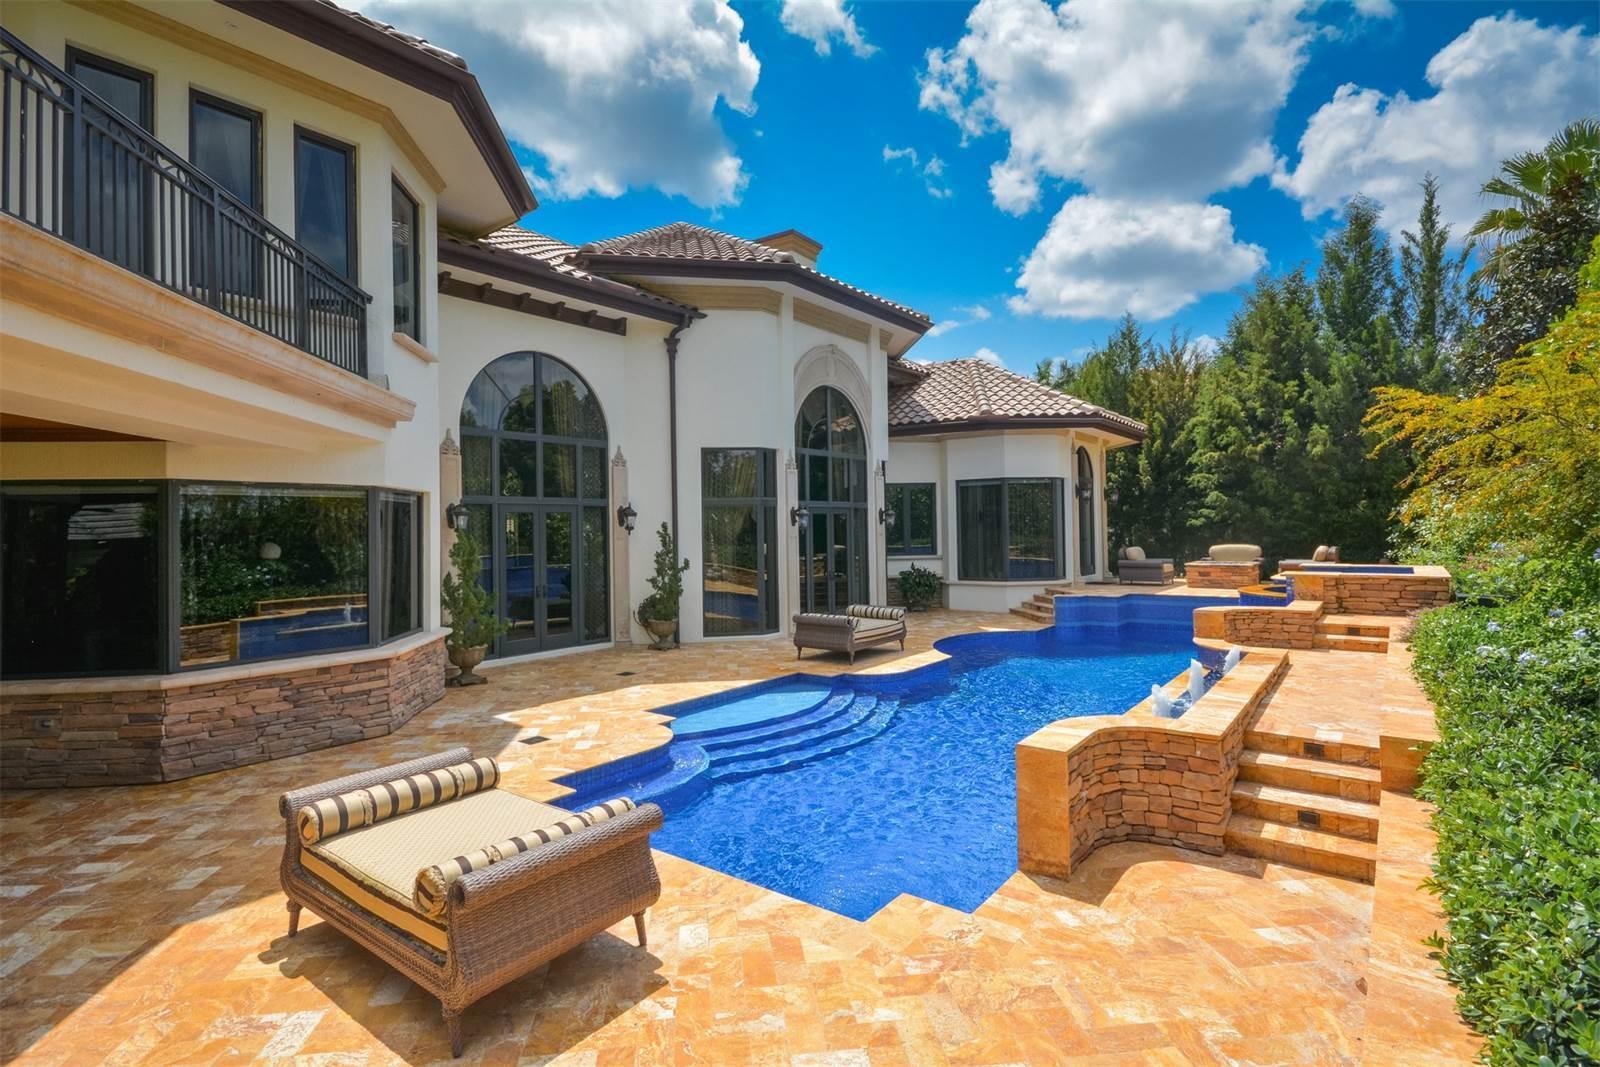 custom-backyard-beautiful-pool-tanning-entertaining.jpeg